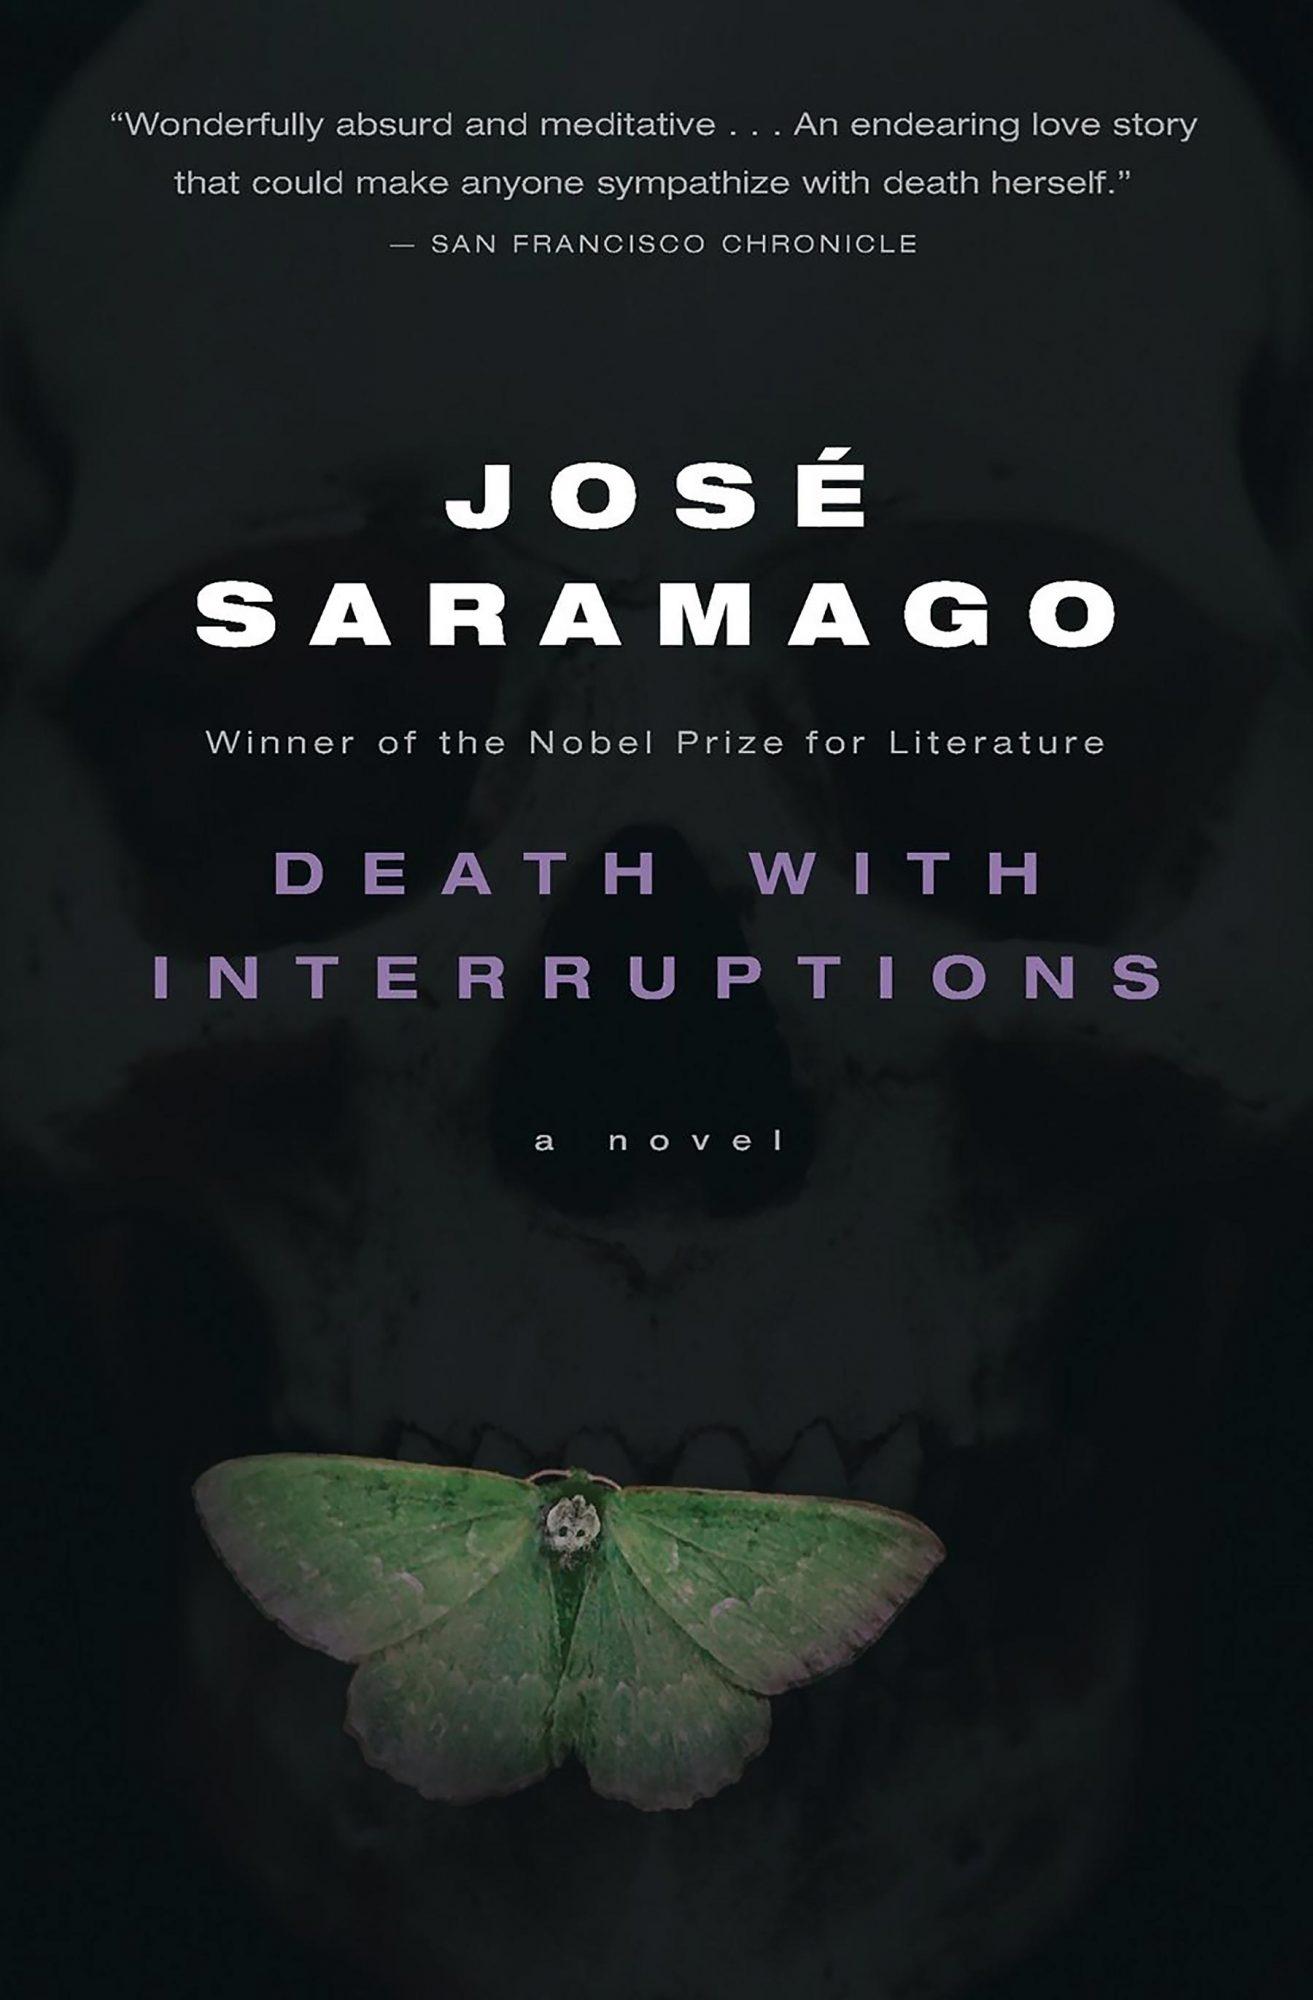 Death with Interruptions by Jose SaramagoCR: Mariner Books